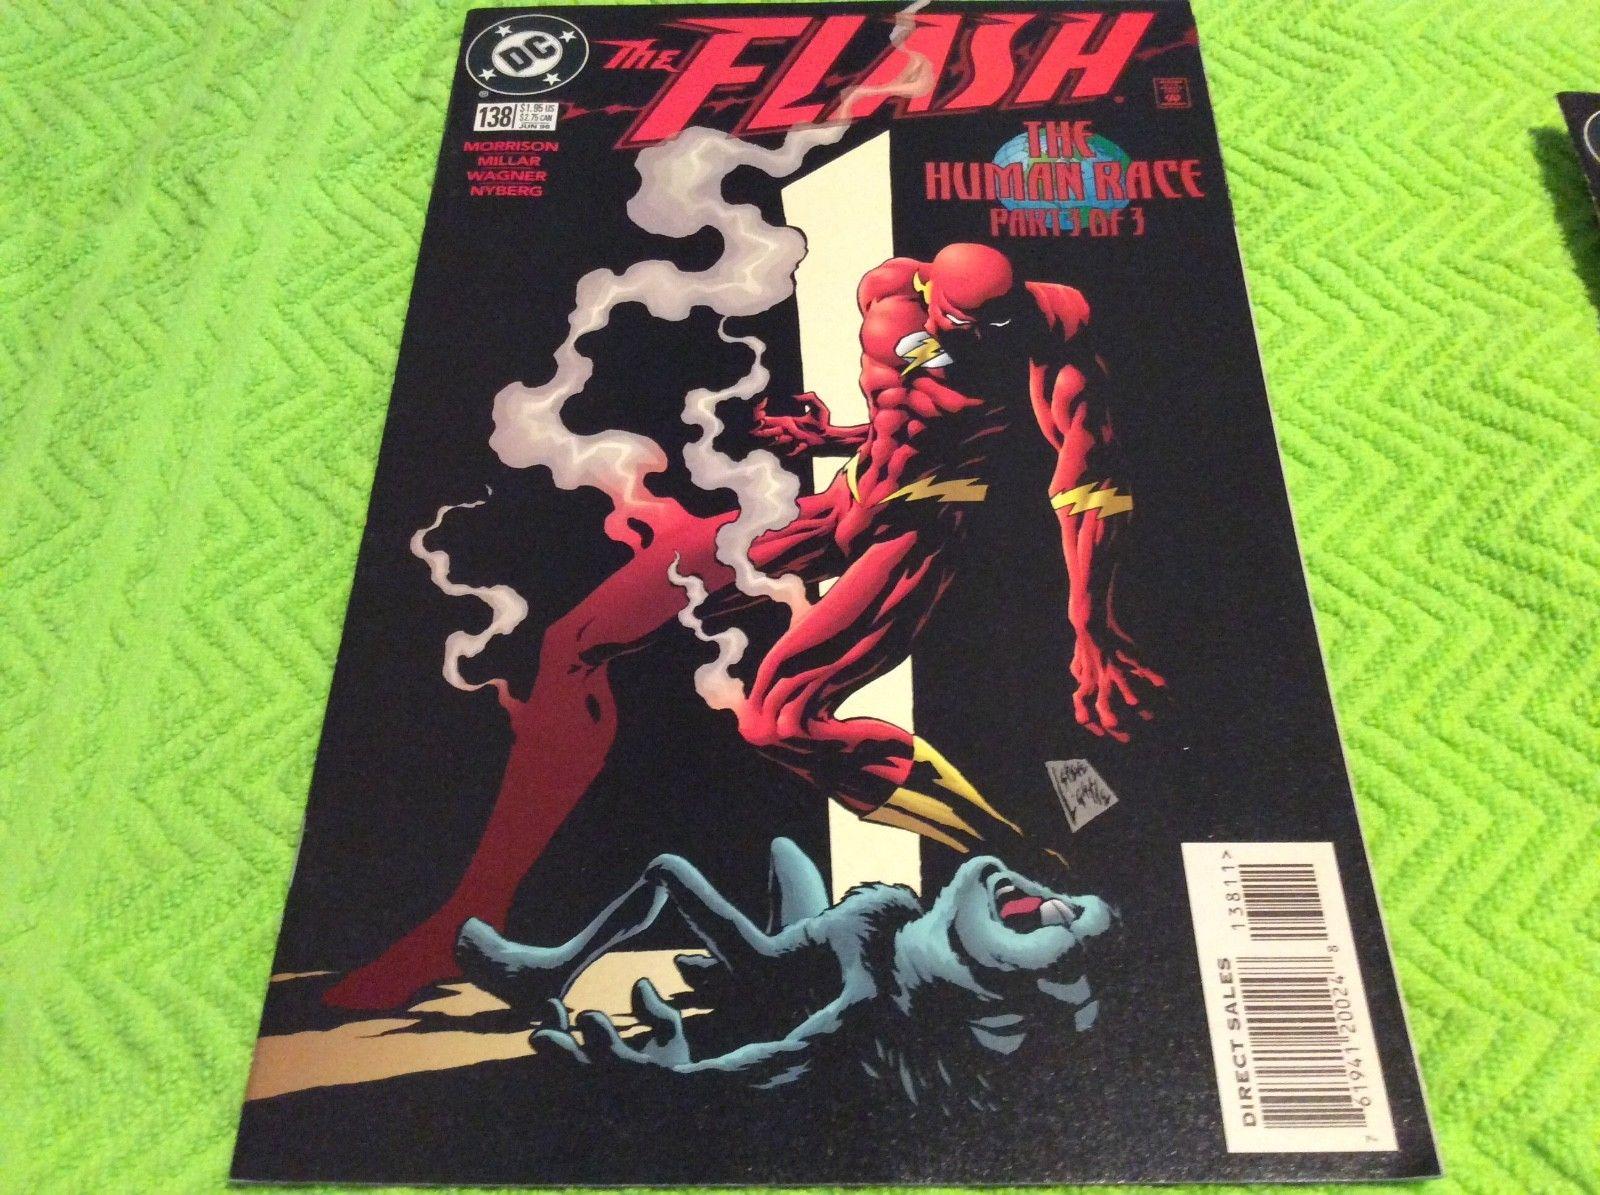 The Flash #138 (1998 DC Comics) First Appearance Black Flash Grant Morrison. NM